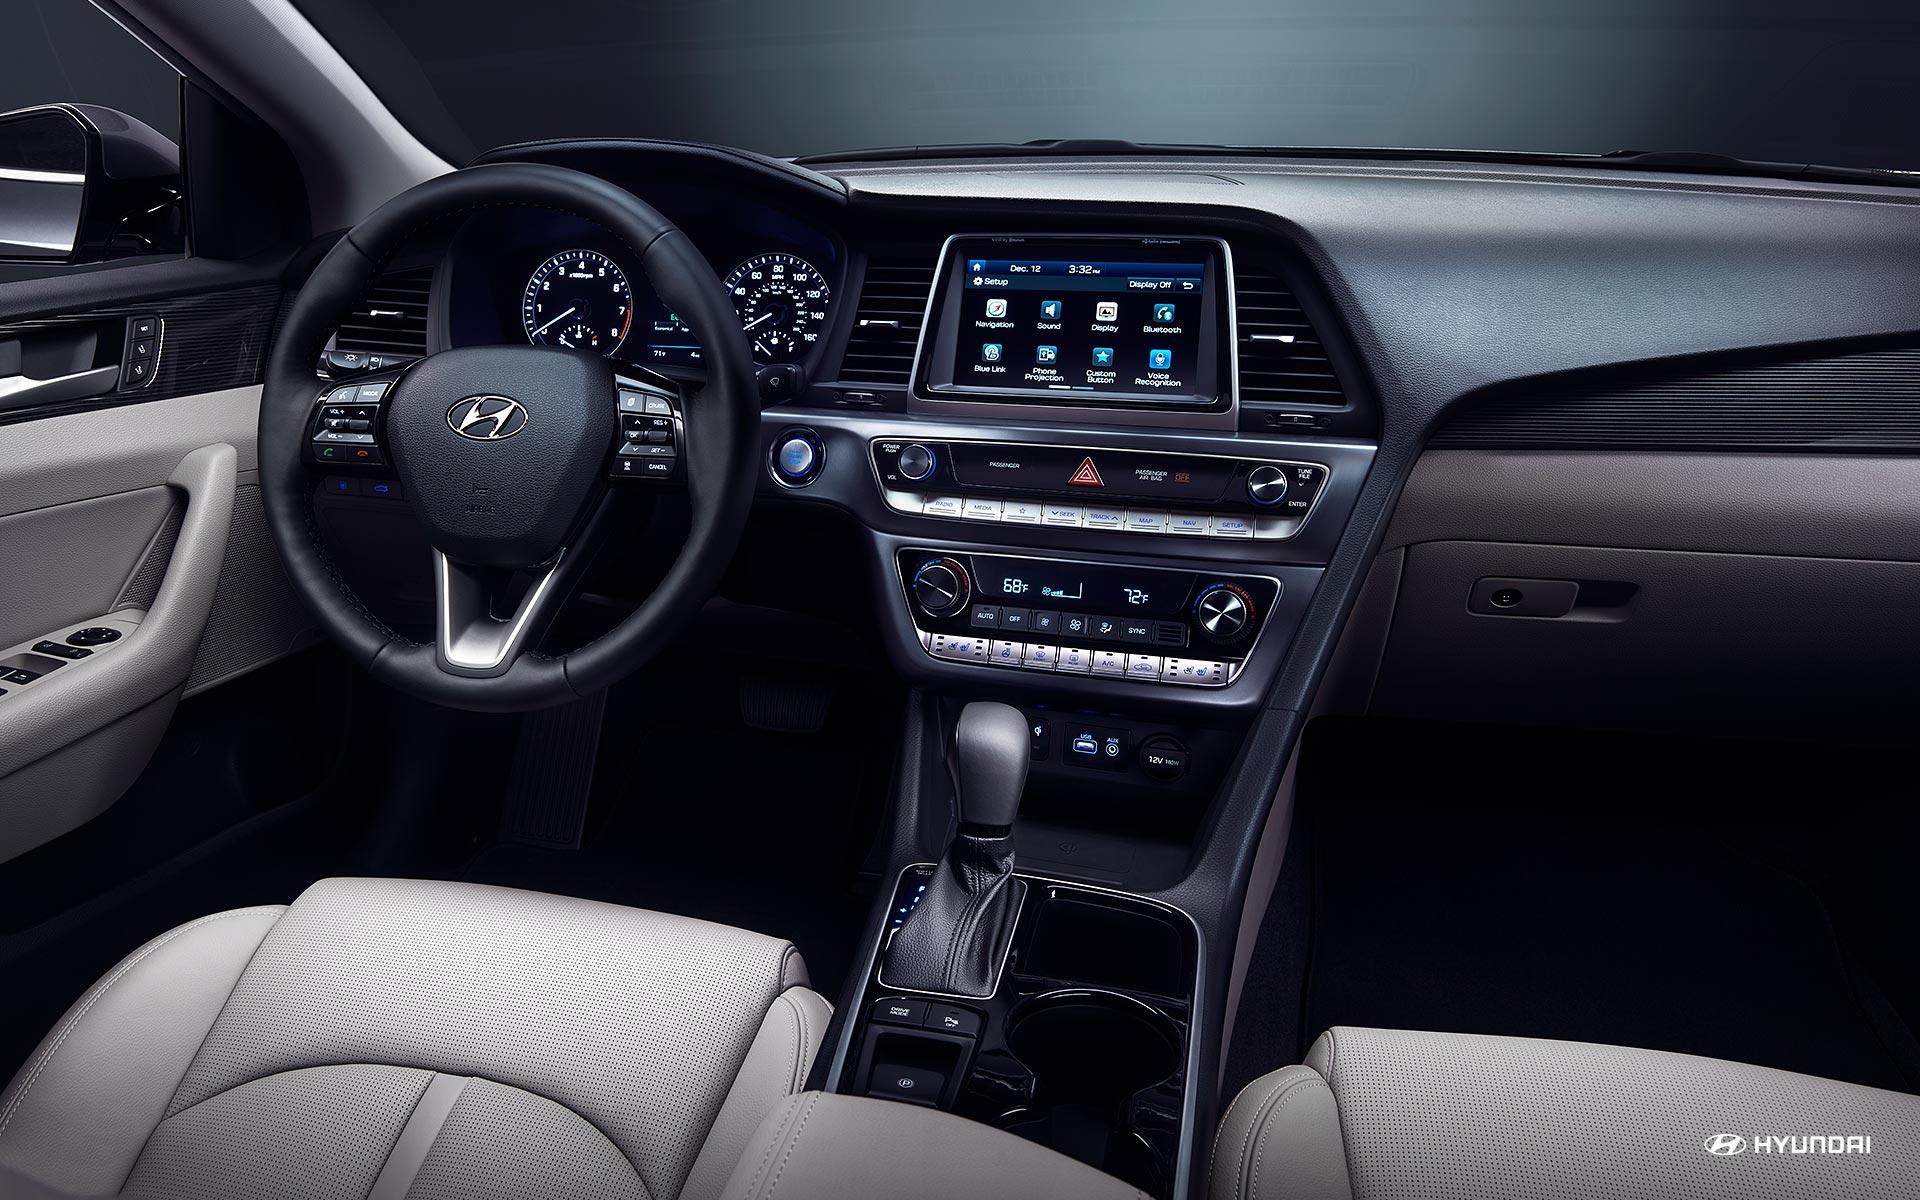 Interior of the 2019 Hyundai Sonata